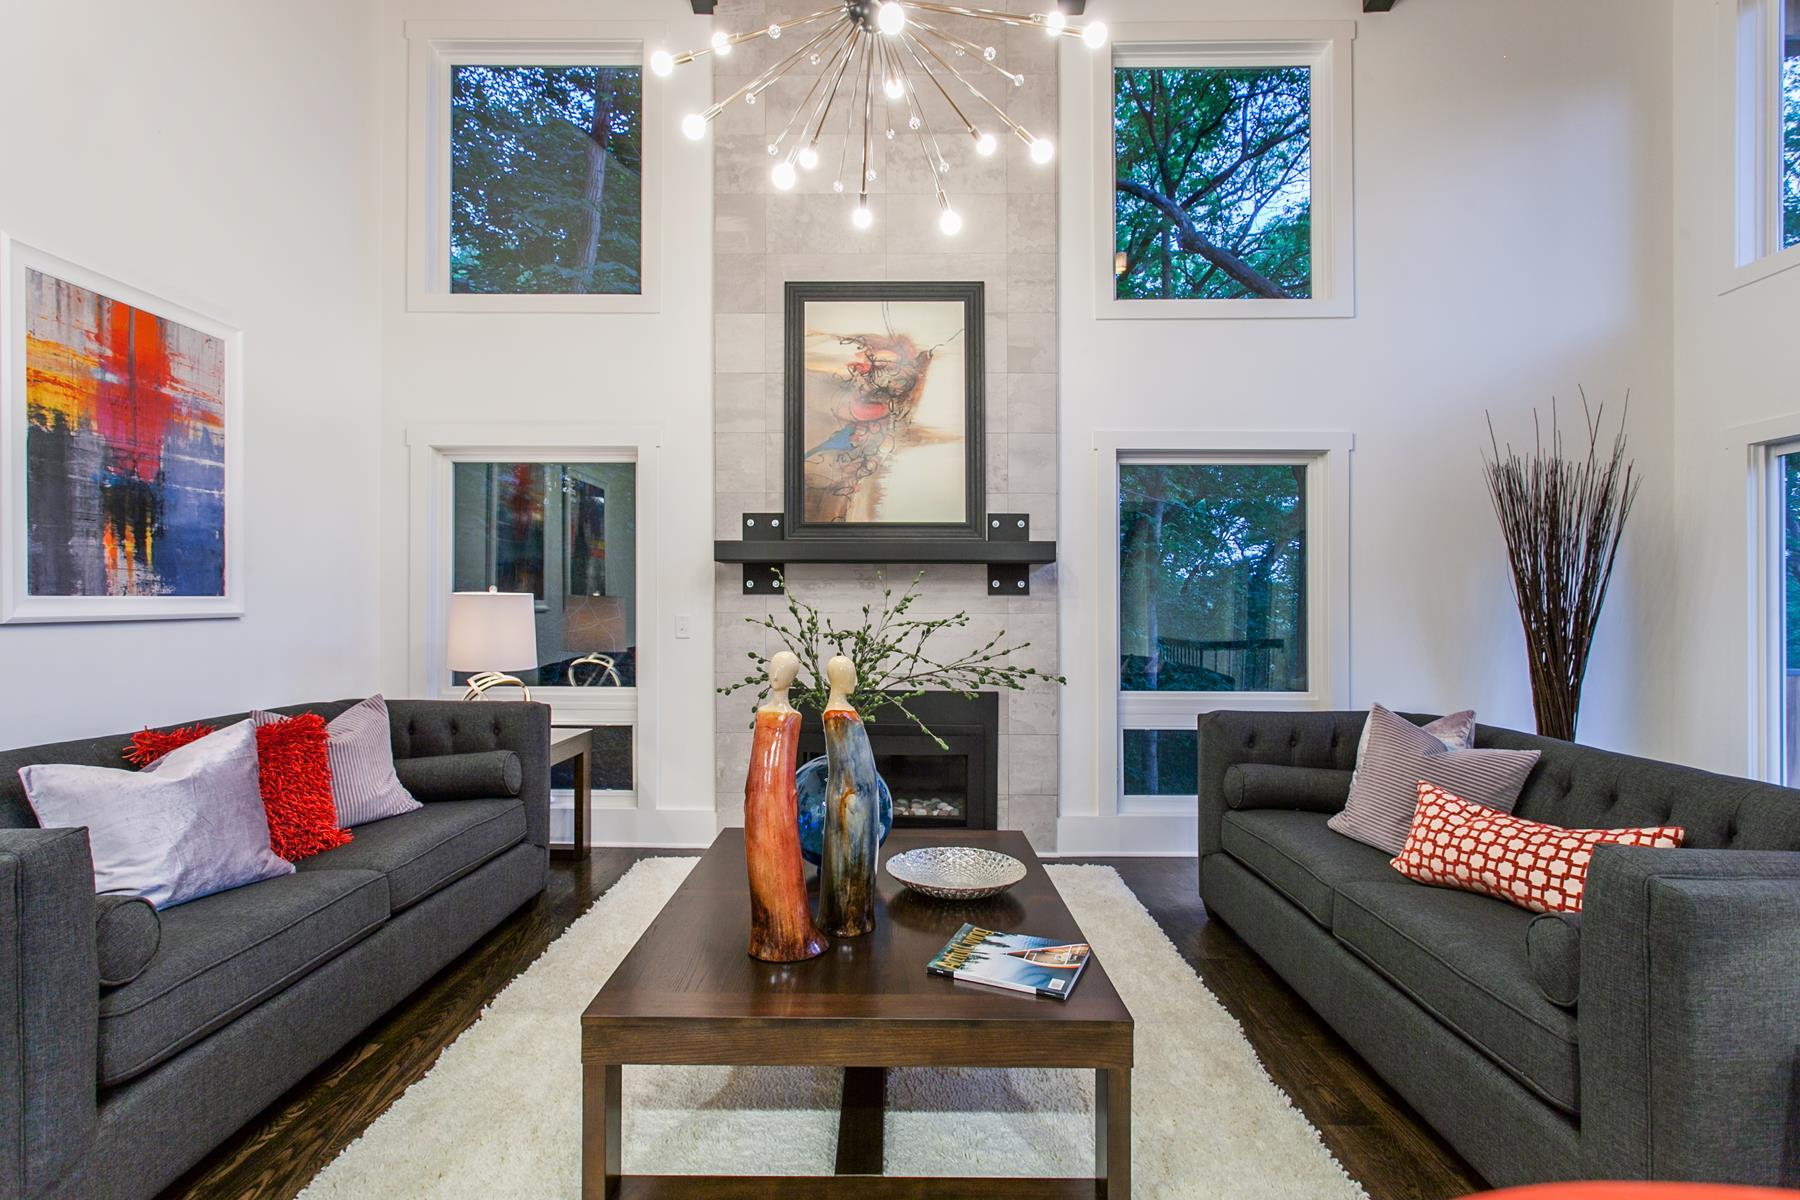 Single Family Home for Sale at 6713 Cheyenne Trail Edina, Minnesota 55439 United States